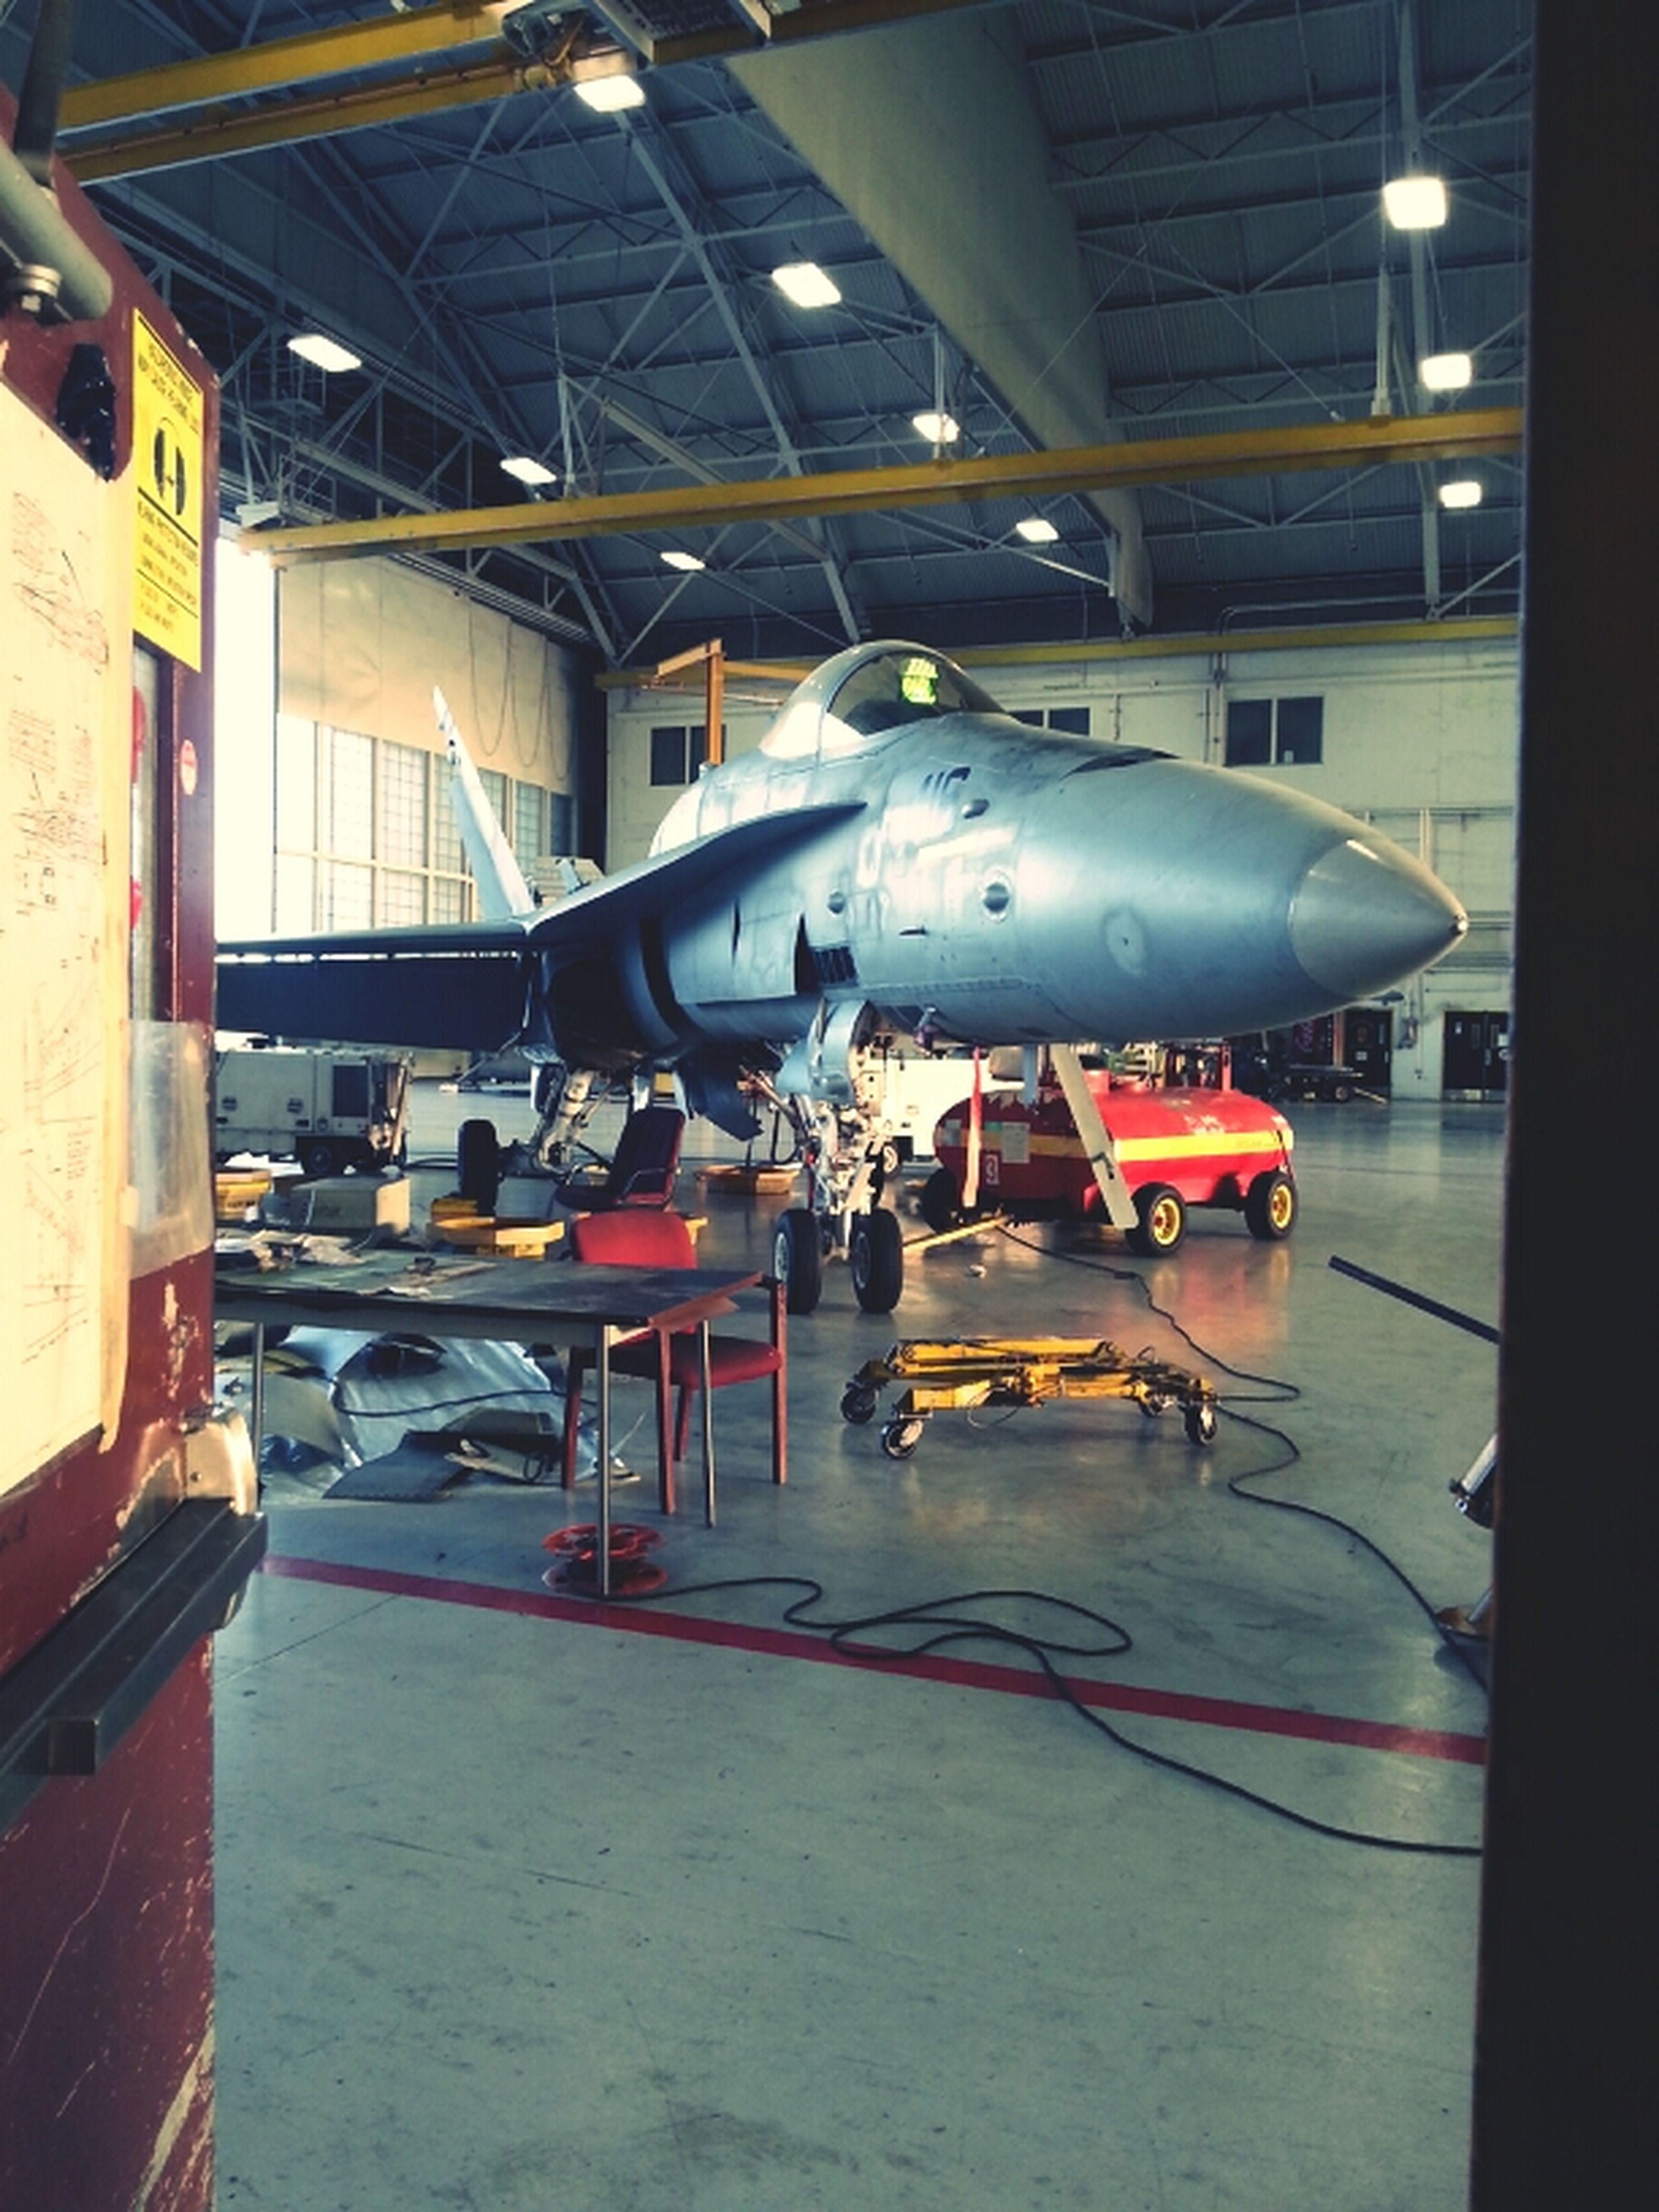 Fixing Jets